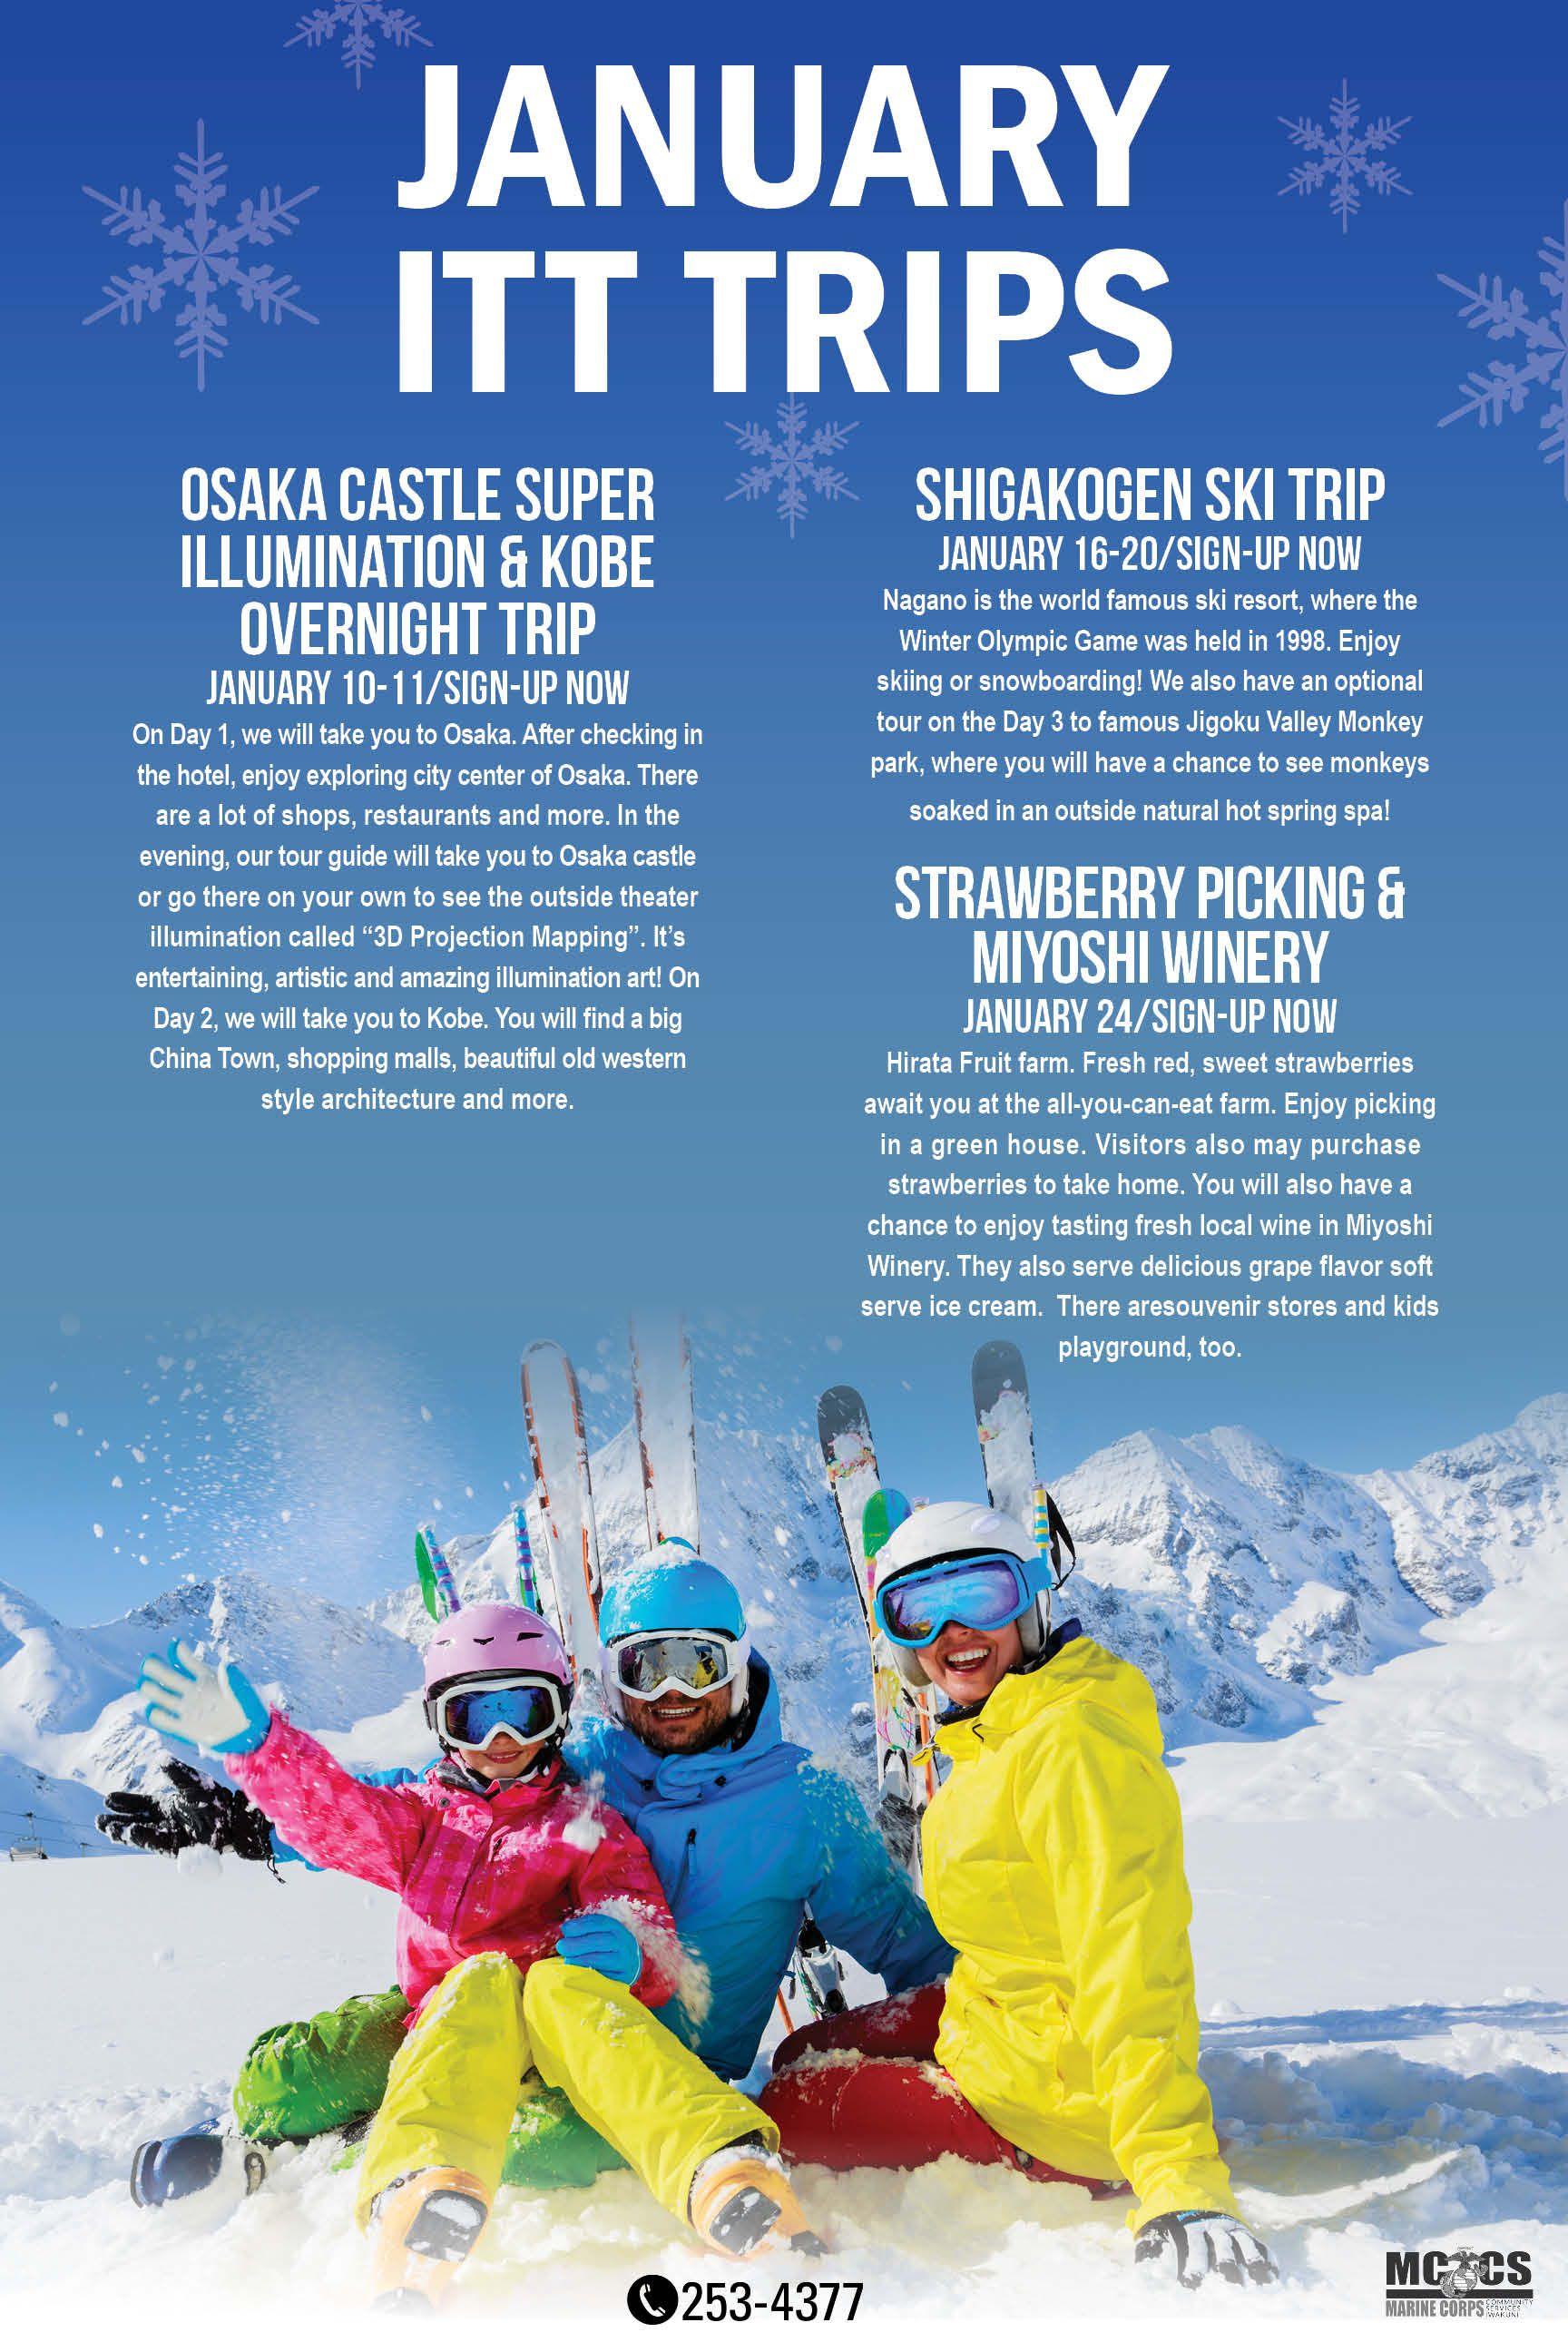 2014 January ITT Trips Osaka castle, Winter olympic